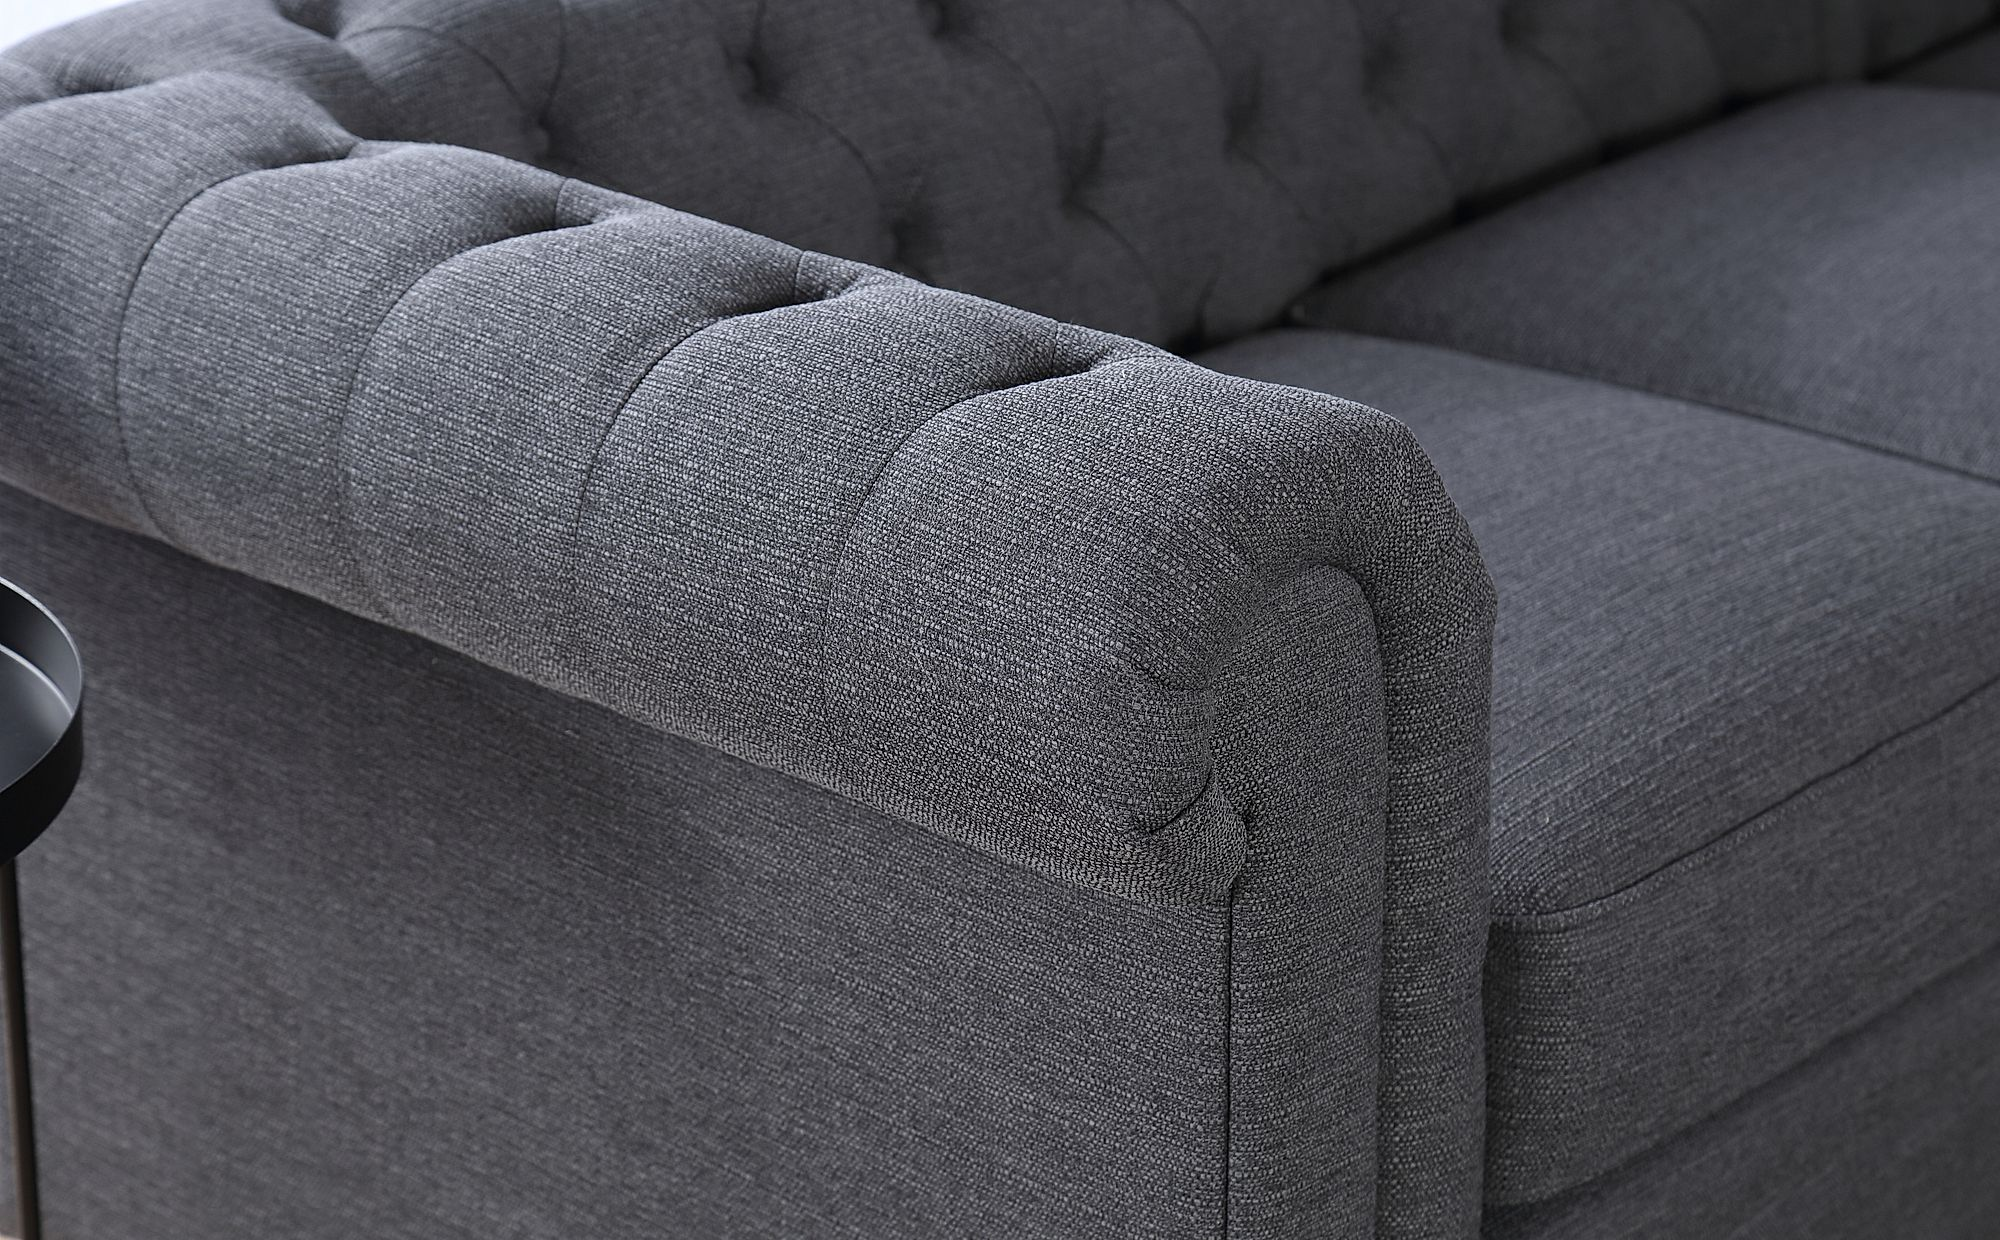 Admirable Hampton Slate Fabric L Shape Chesterfield Corner Sofa Inzonedesignstudio Interior Chair Design Inzonedesignstudiocom